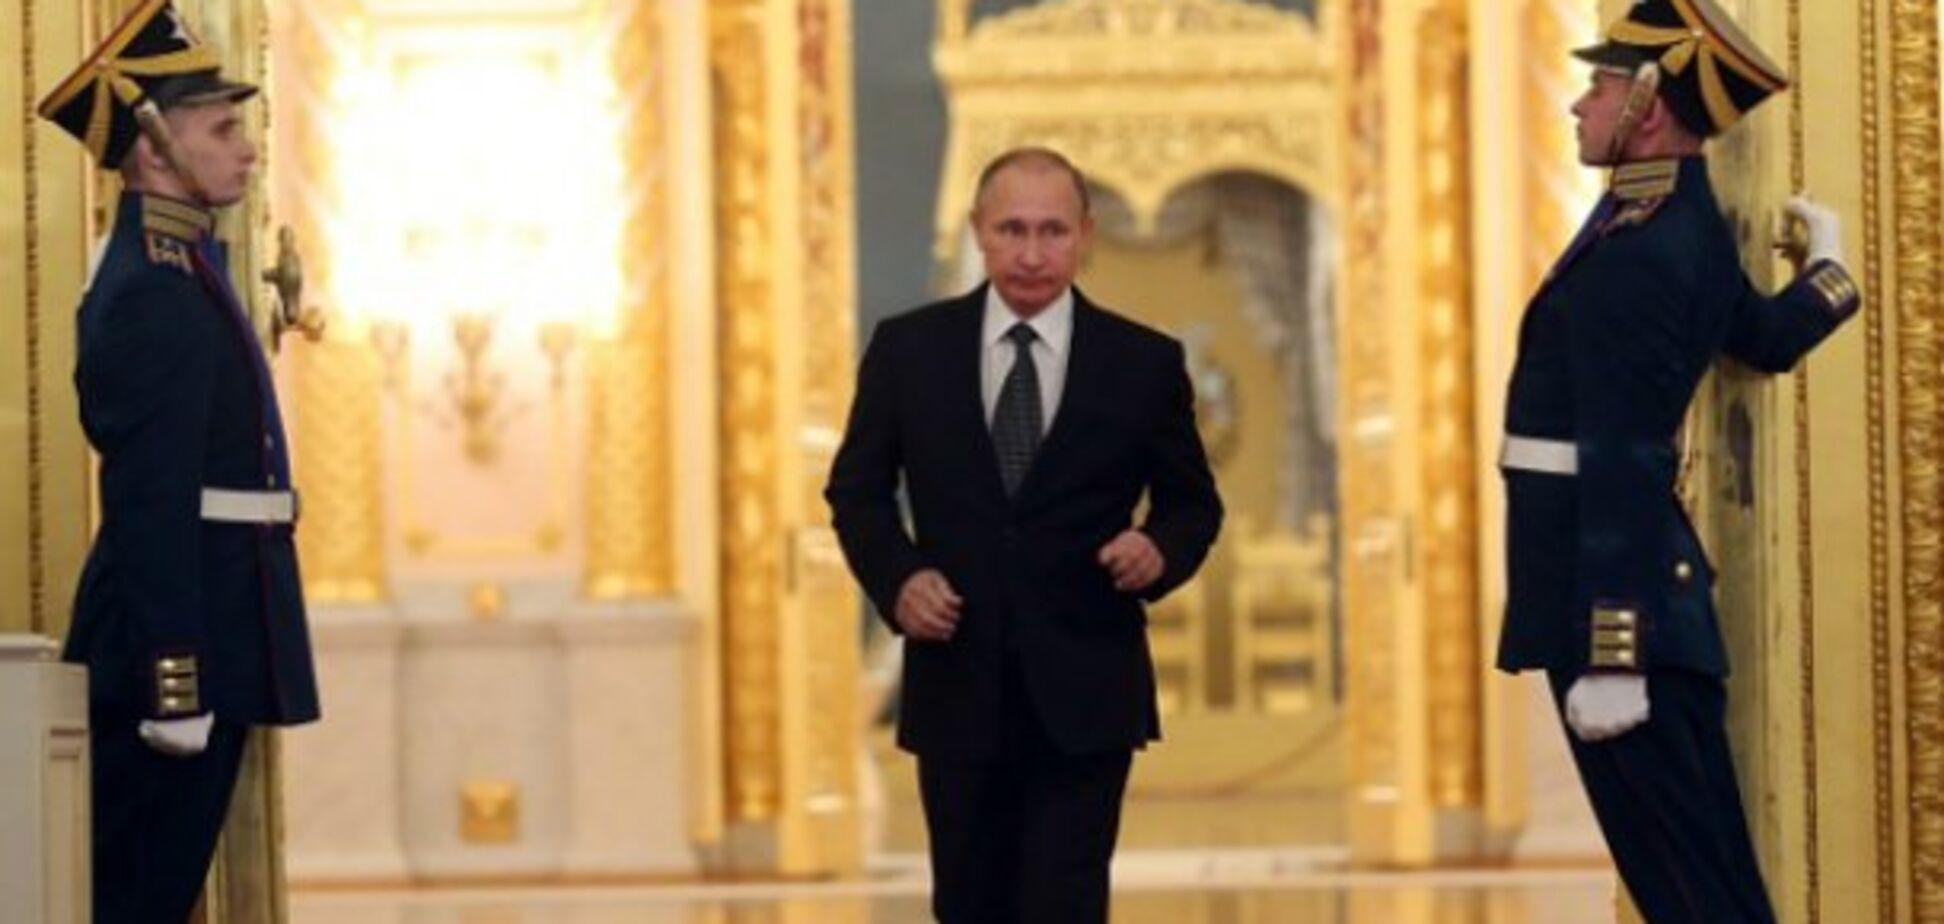 Фильм о Путине соберет огромную кассу